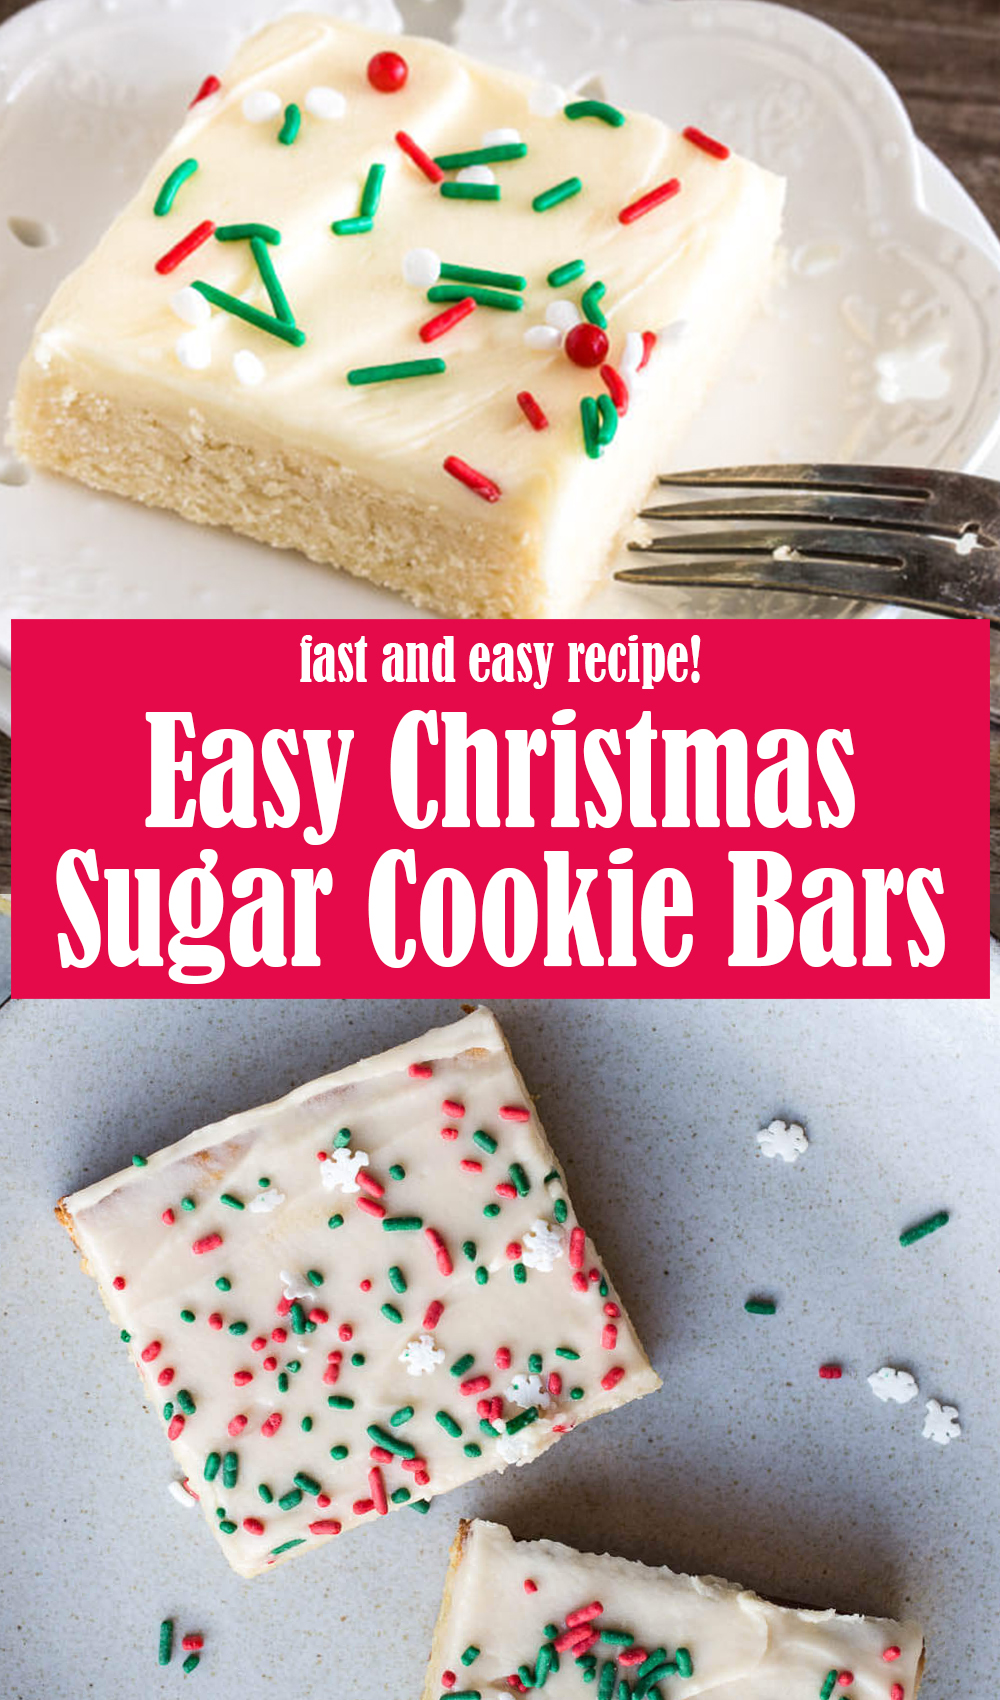 Easy Christmas Sugar Cookie Bars